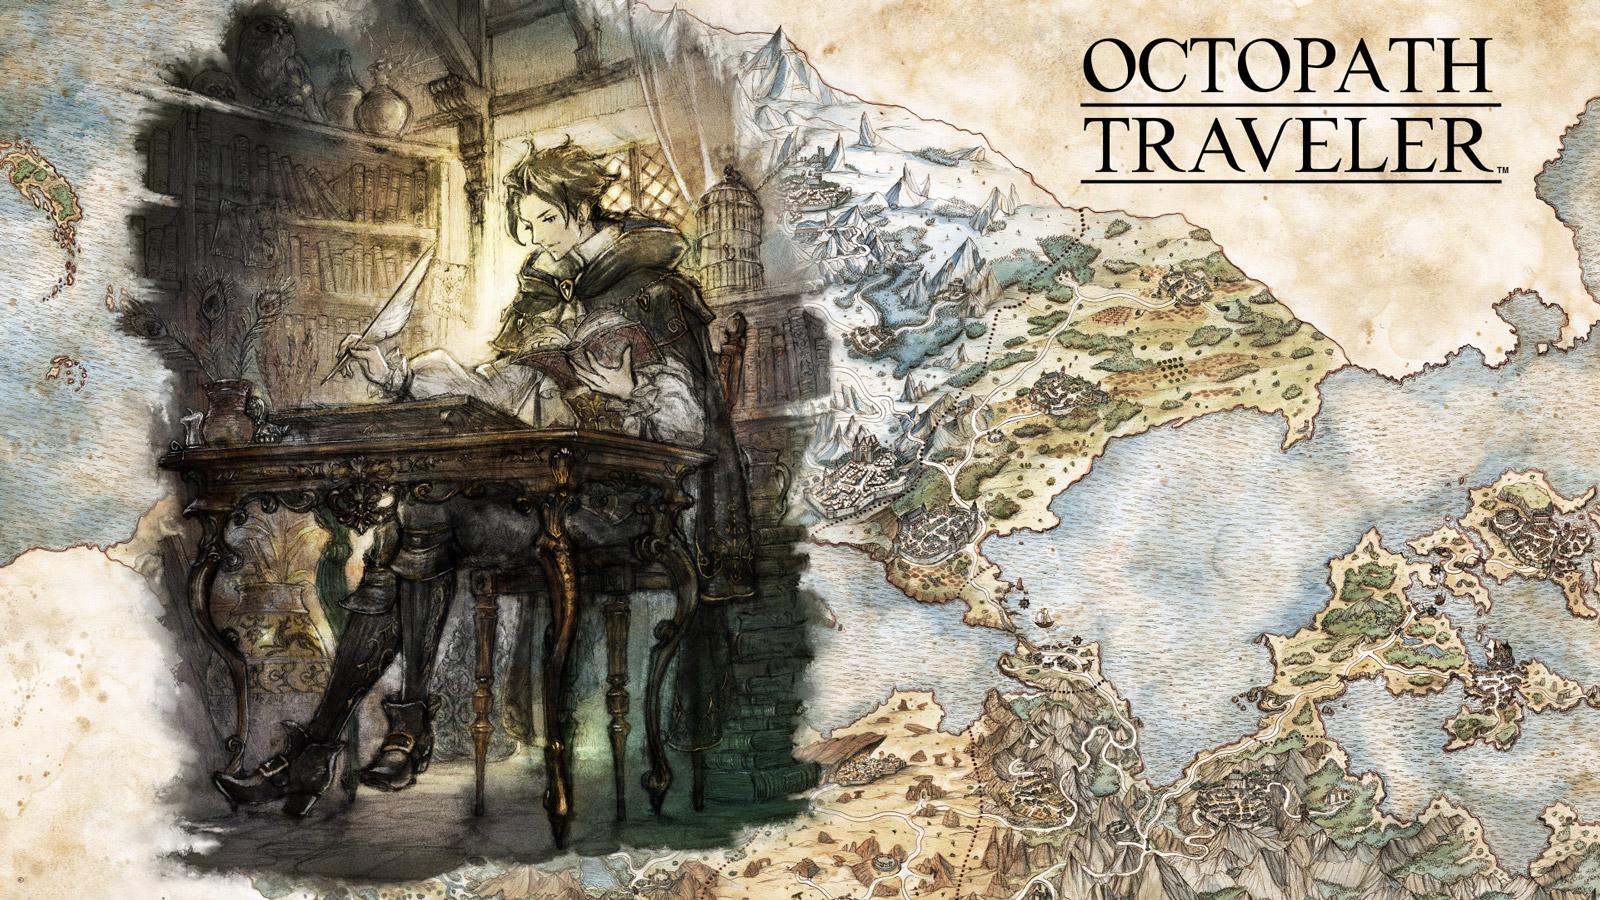 Free Octopath Traveler Wallpaper in 1600x900